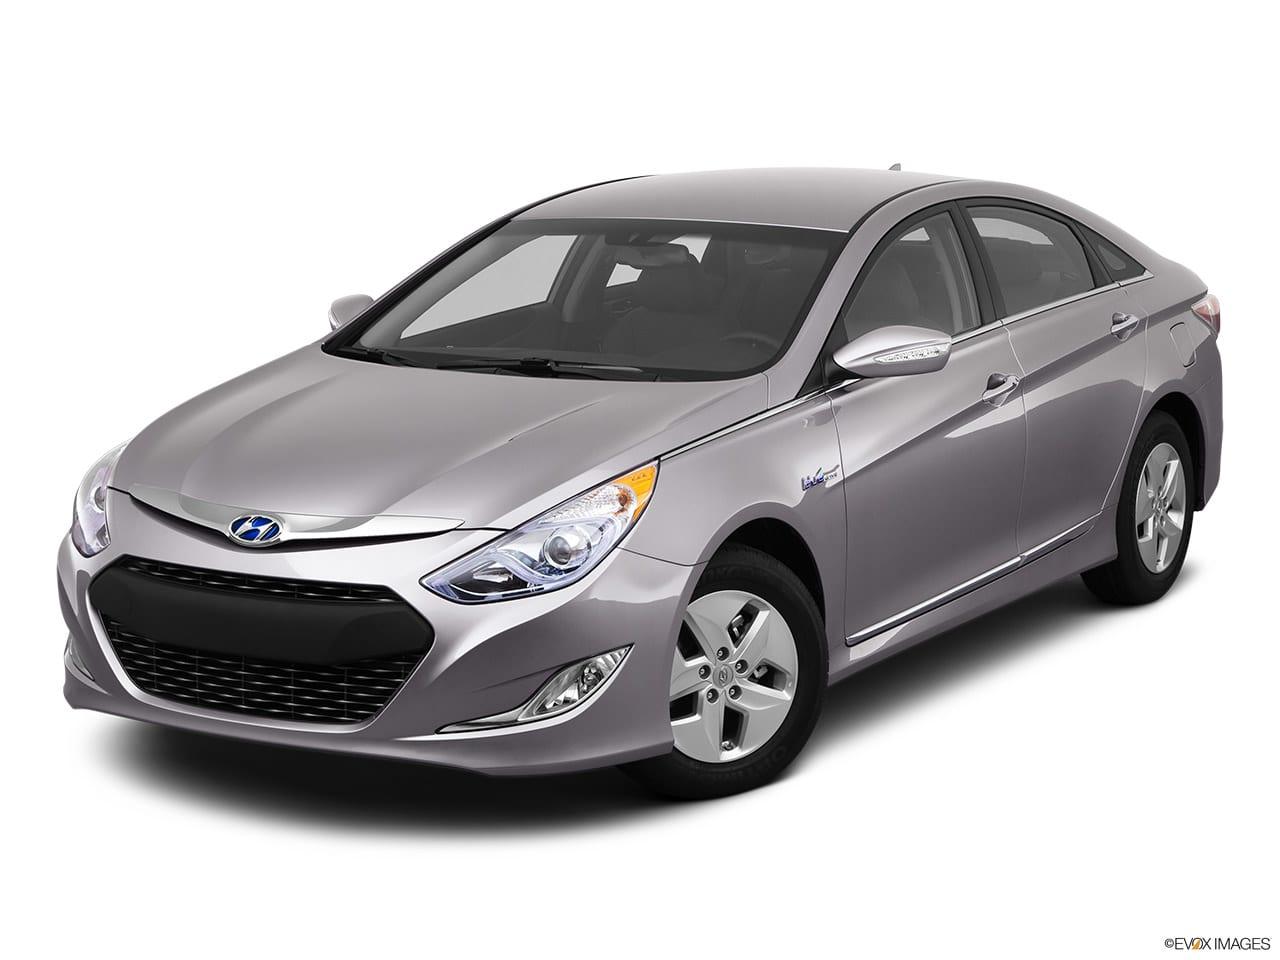 2012 Hyundai Sonata Vs 2012 Hyundai Elantra Which One Should I Buy